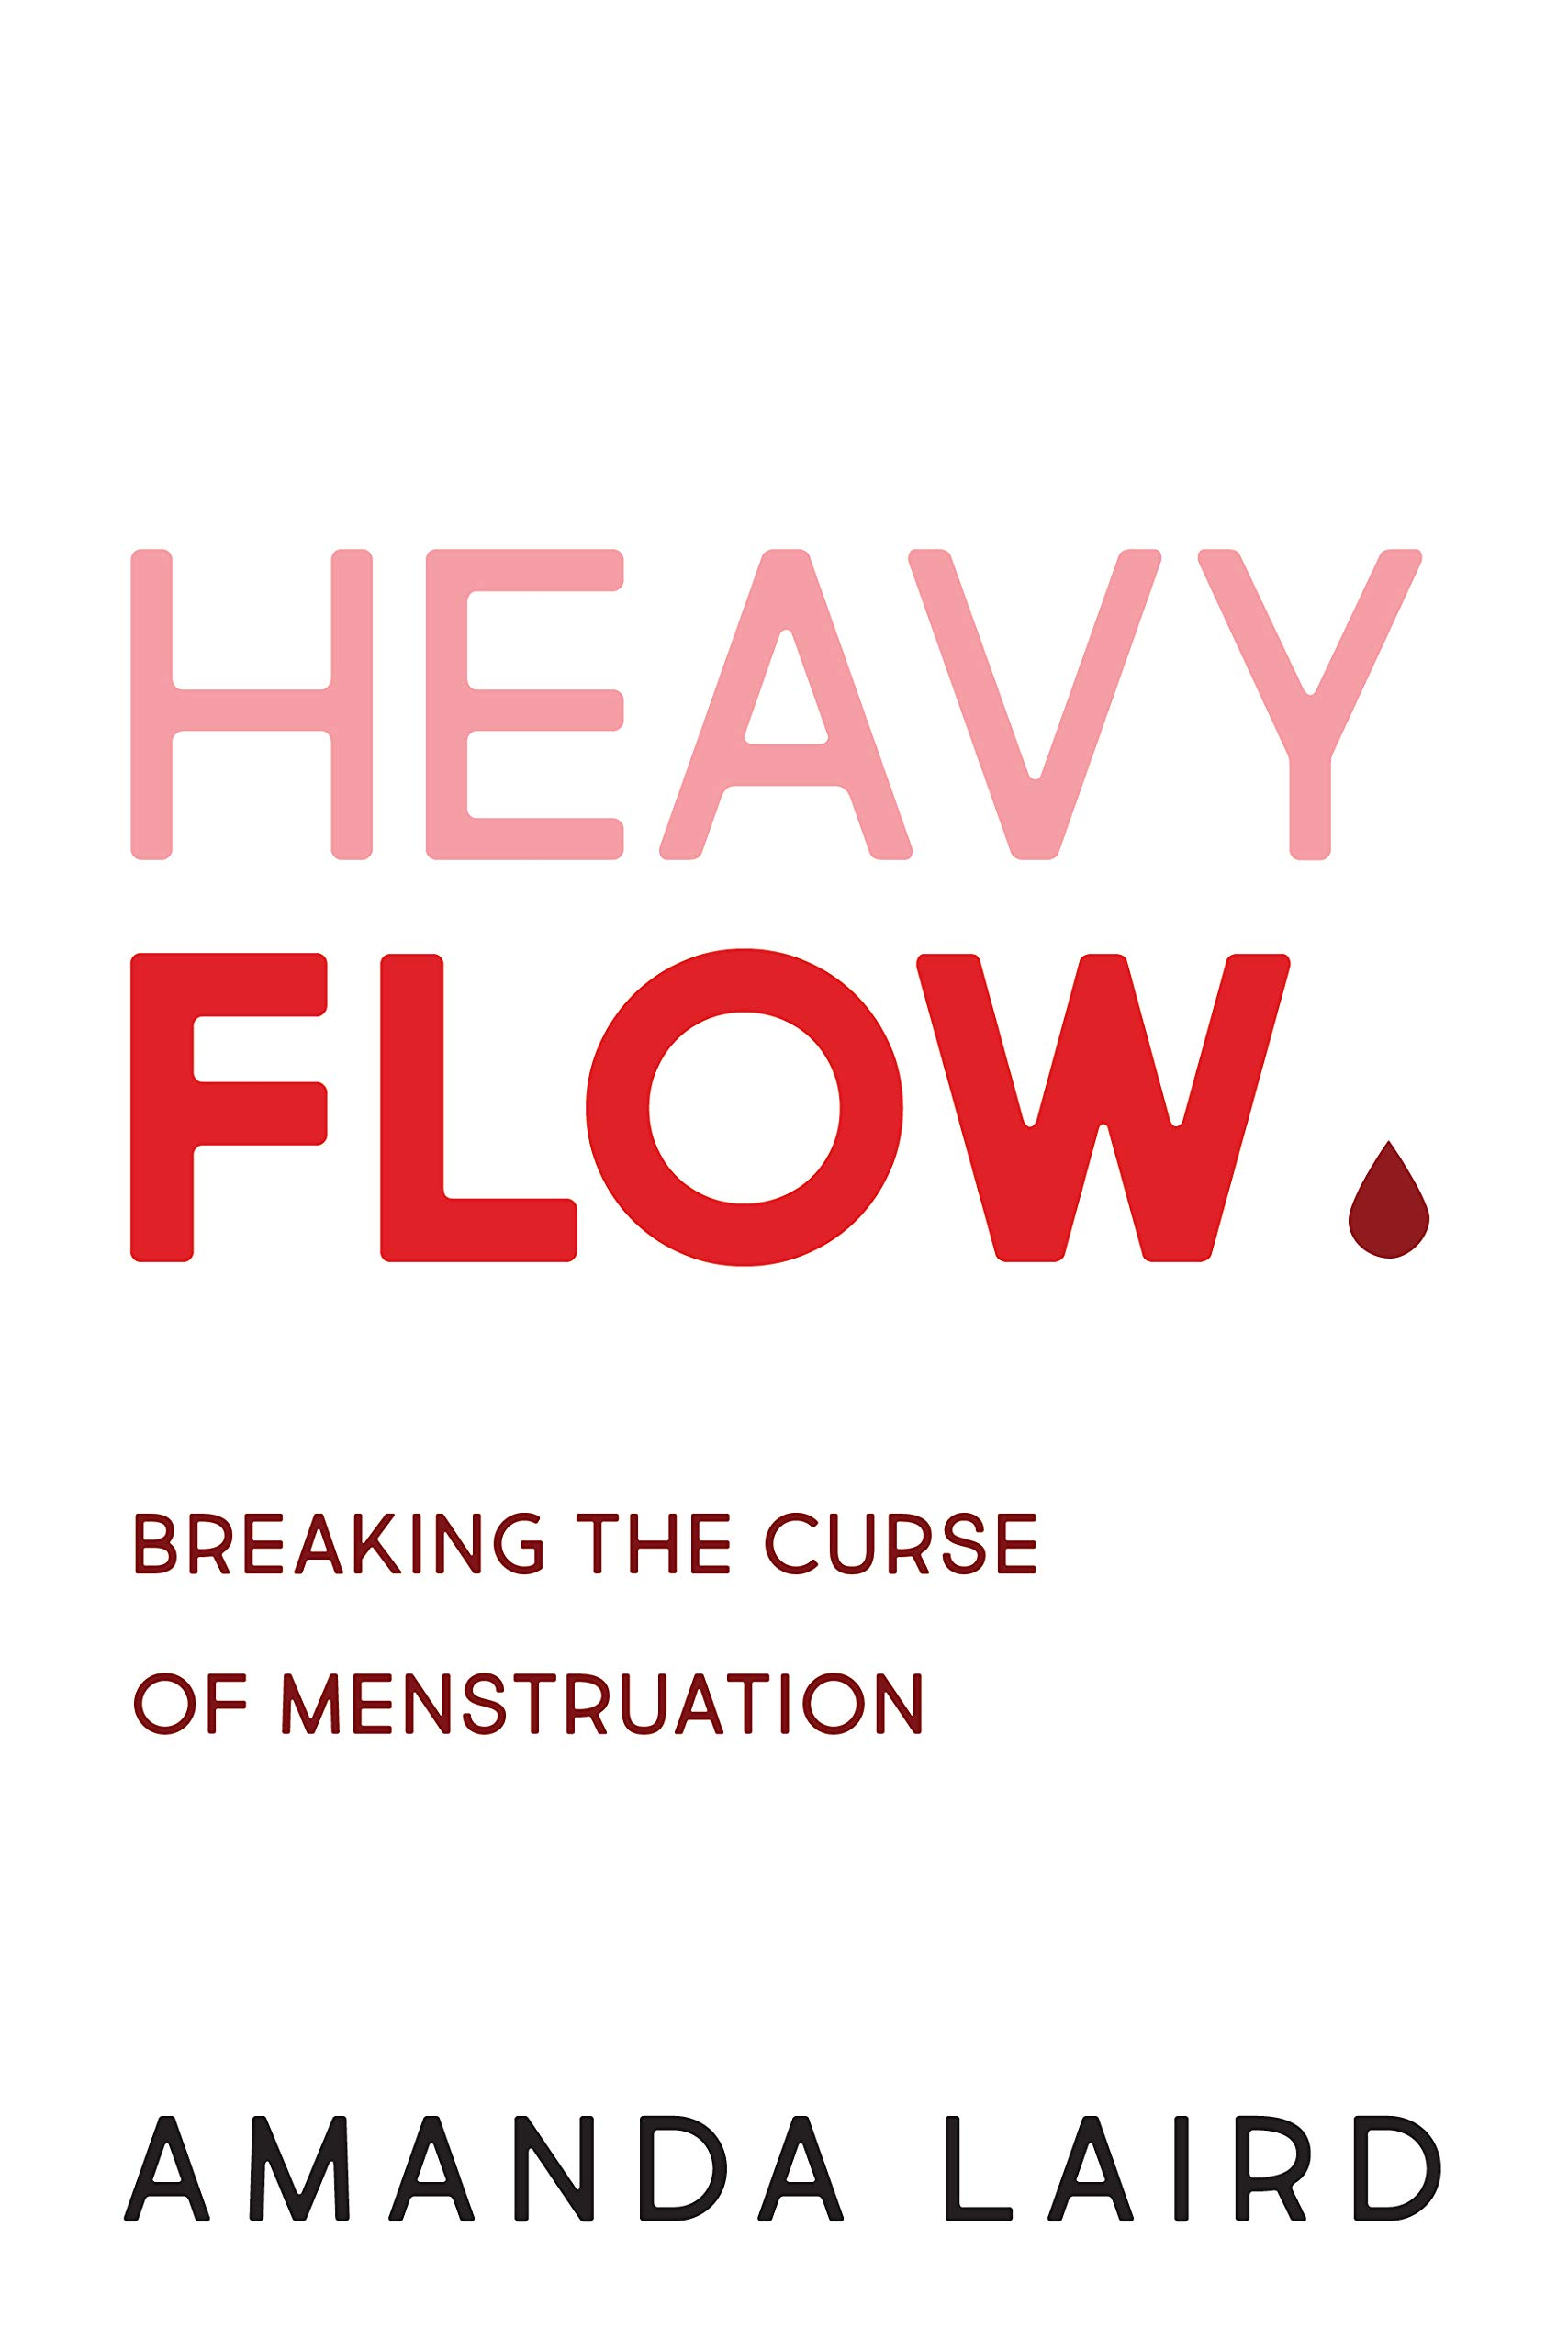 Heavy Flow: Breaking the Curse of Menstruation: Amanda Laird